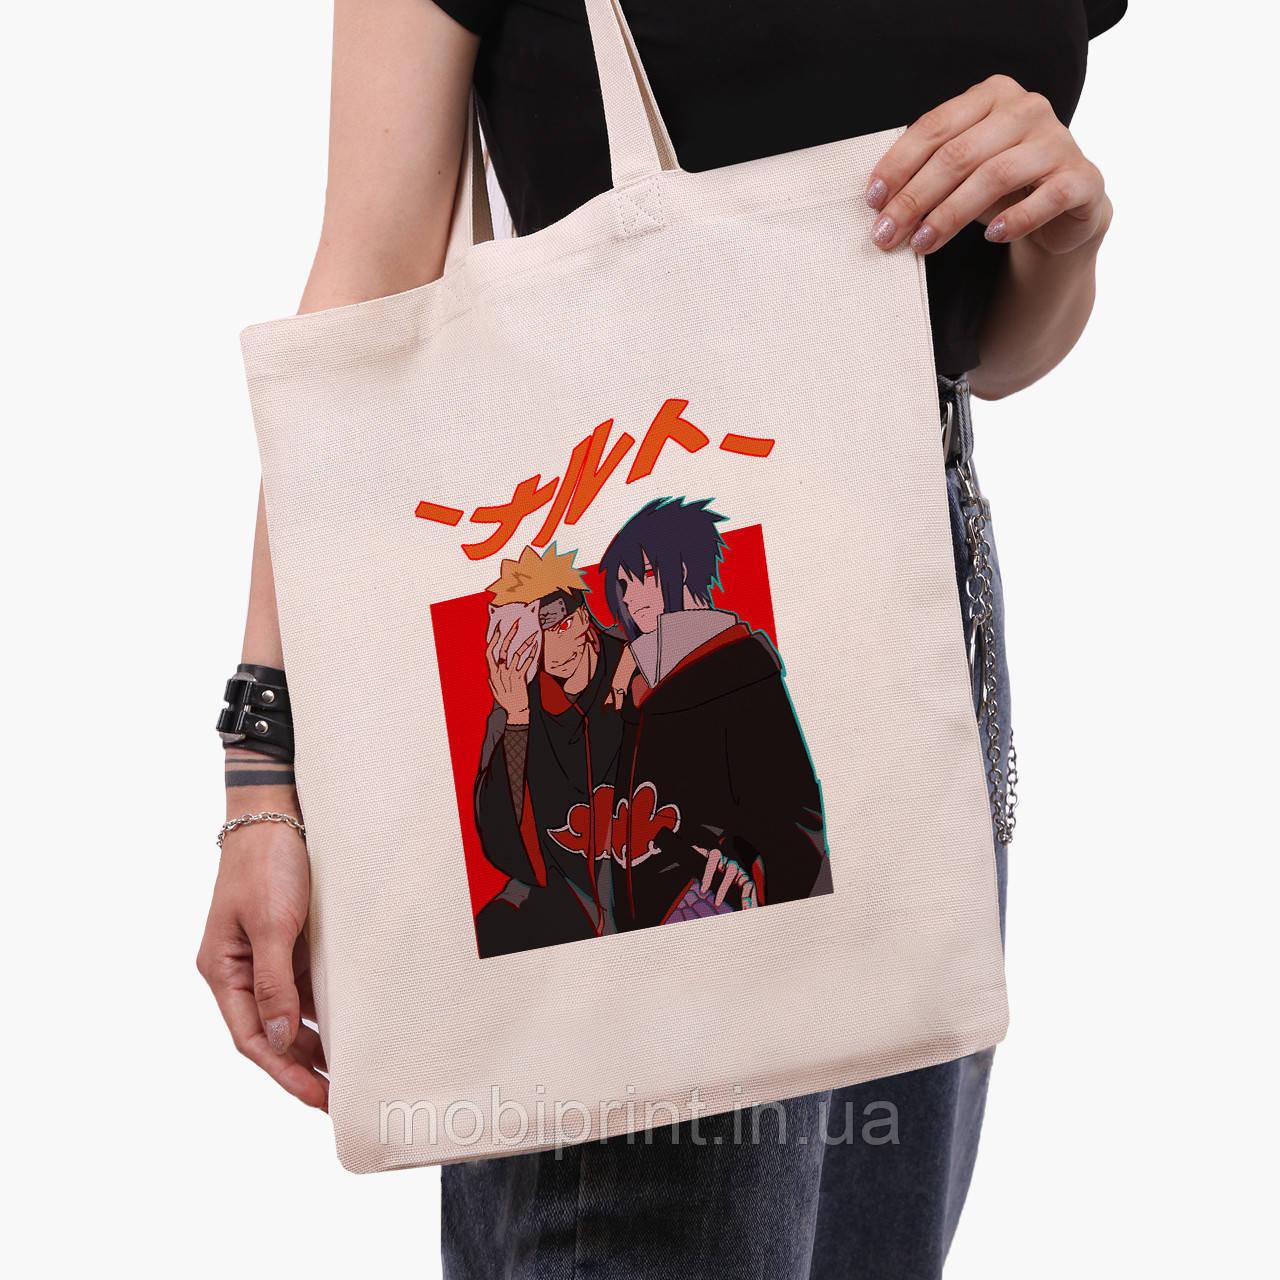 Еко сумка шоппер Узумакі Наруто і Саске Учіха (Naruto Uzumaki and Sasuke Uchiha) (9227-2815) 41*35 см